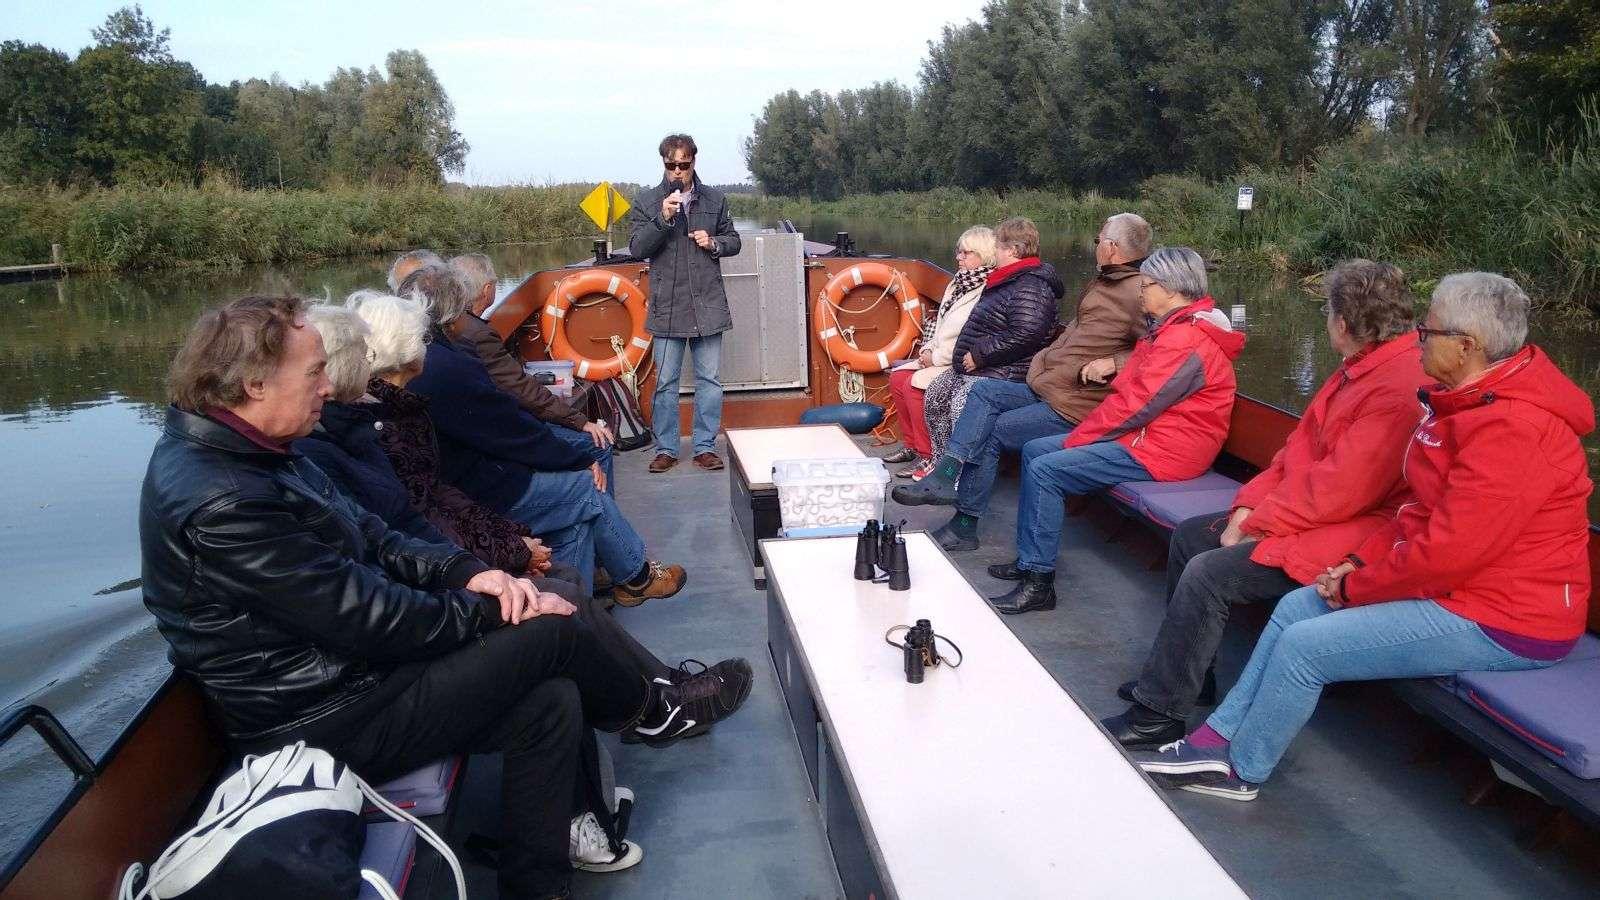 http://uvv-zoetermeer.nl/wp-content/uploads/2017/03/IMG_20161014_132946238-1.jpg